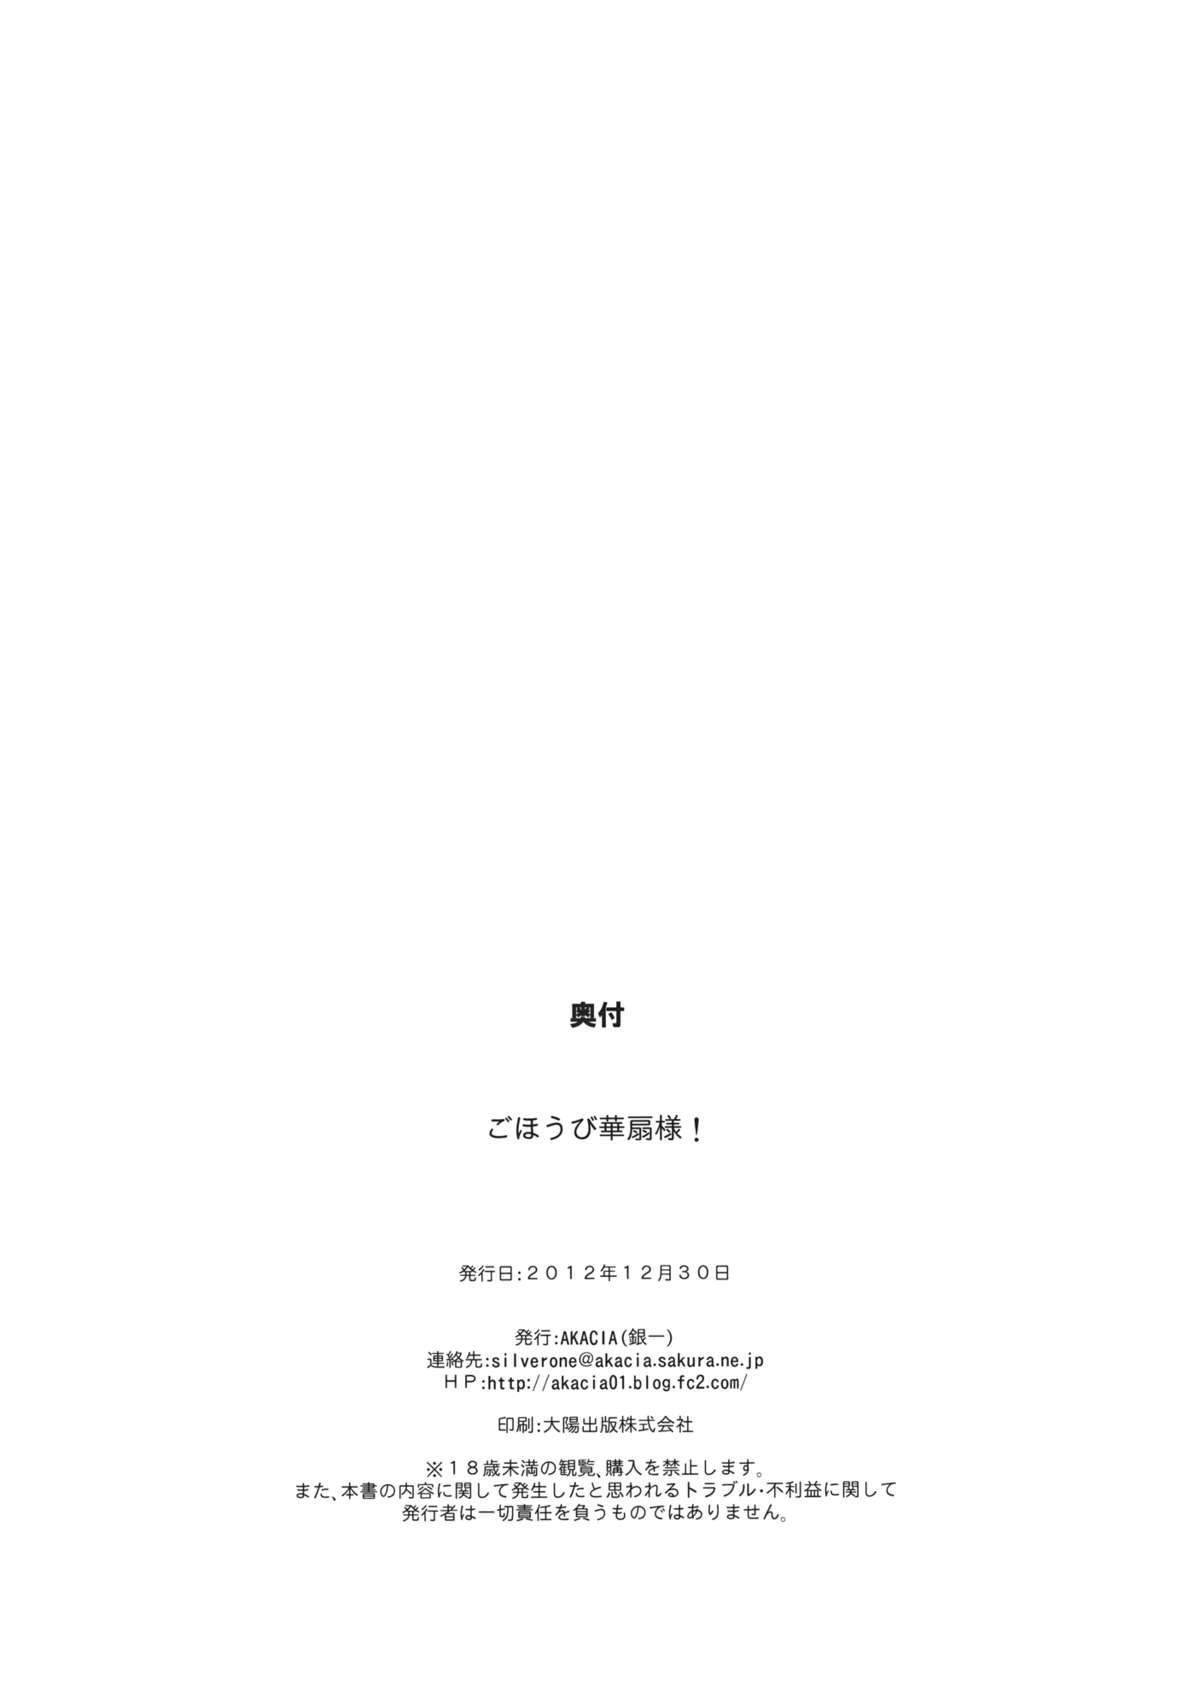 Gohoubi Kasen-sama! 23